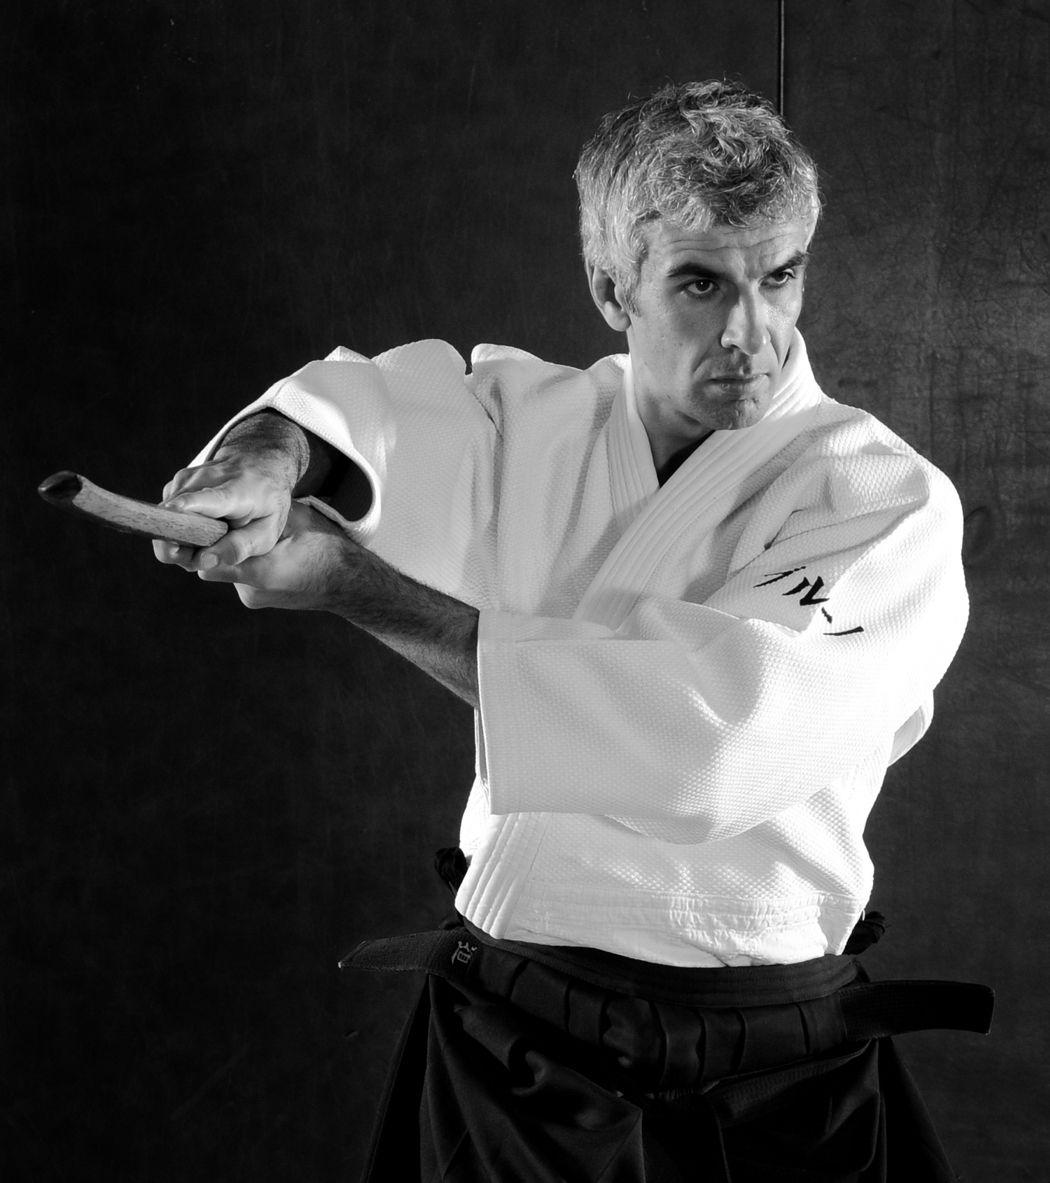 http://aikido-brunogonzalez.com/